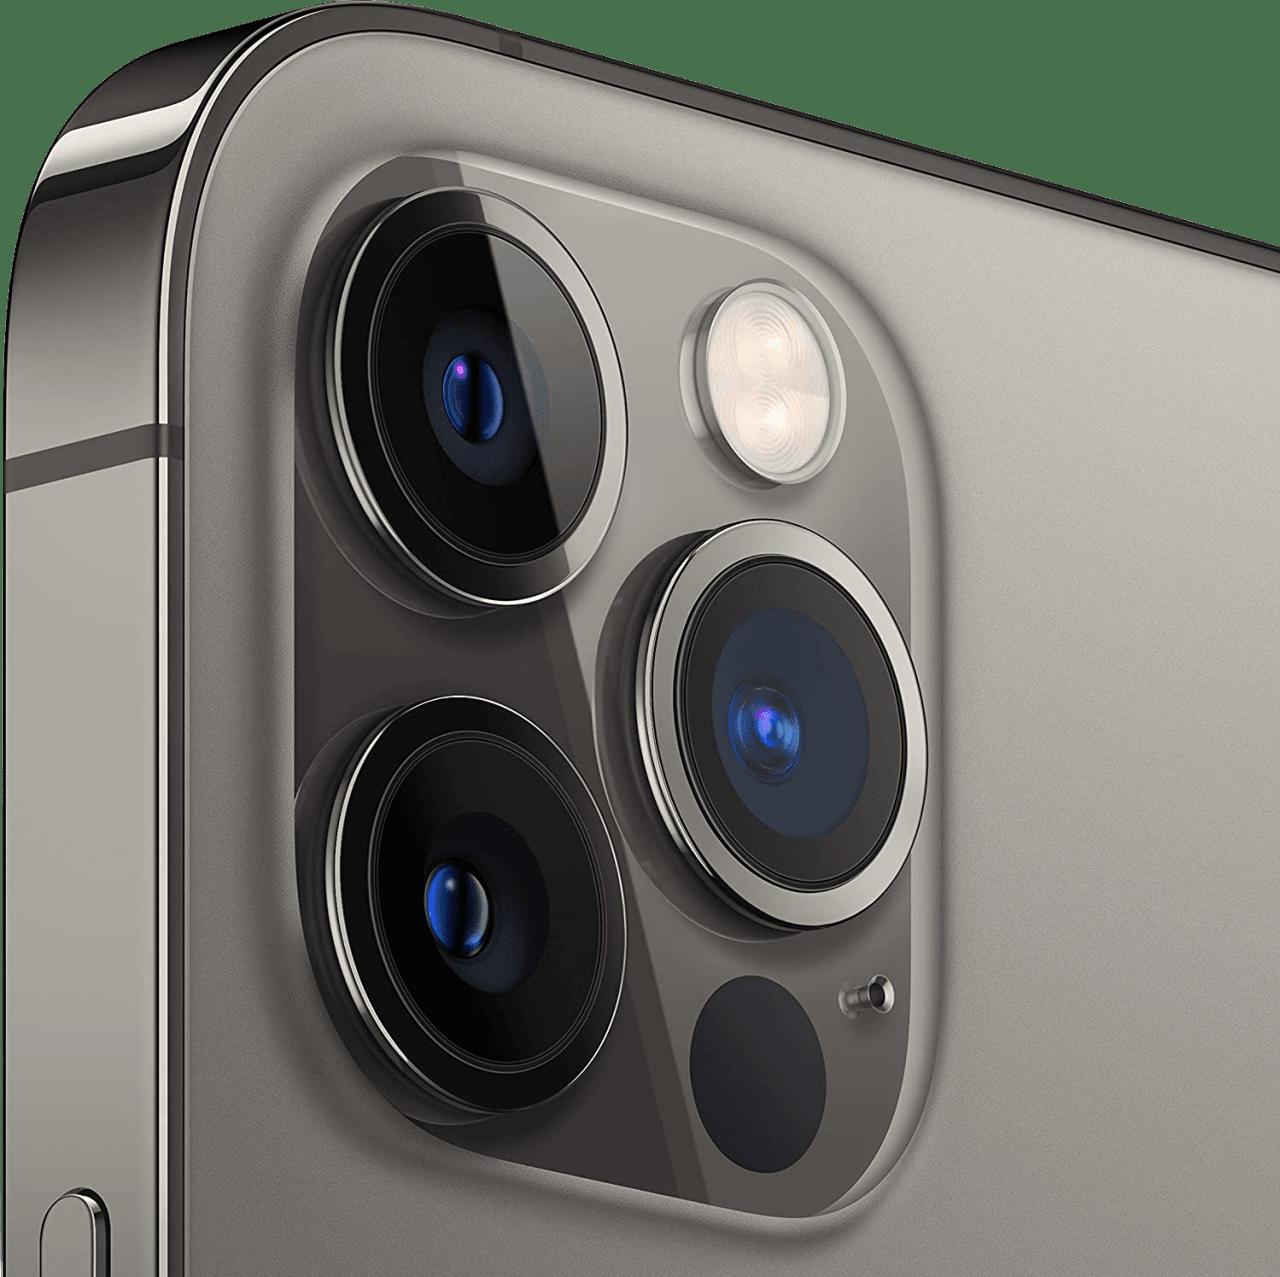 Grau Apple iPhone 12 Pro Max 512GB.4